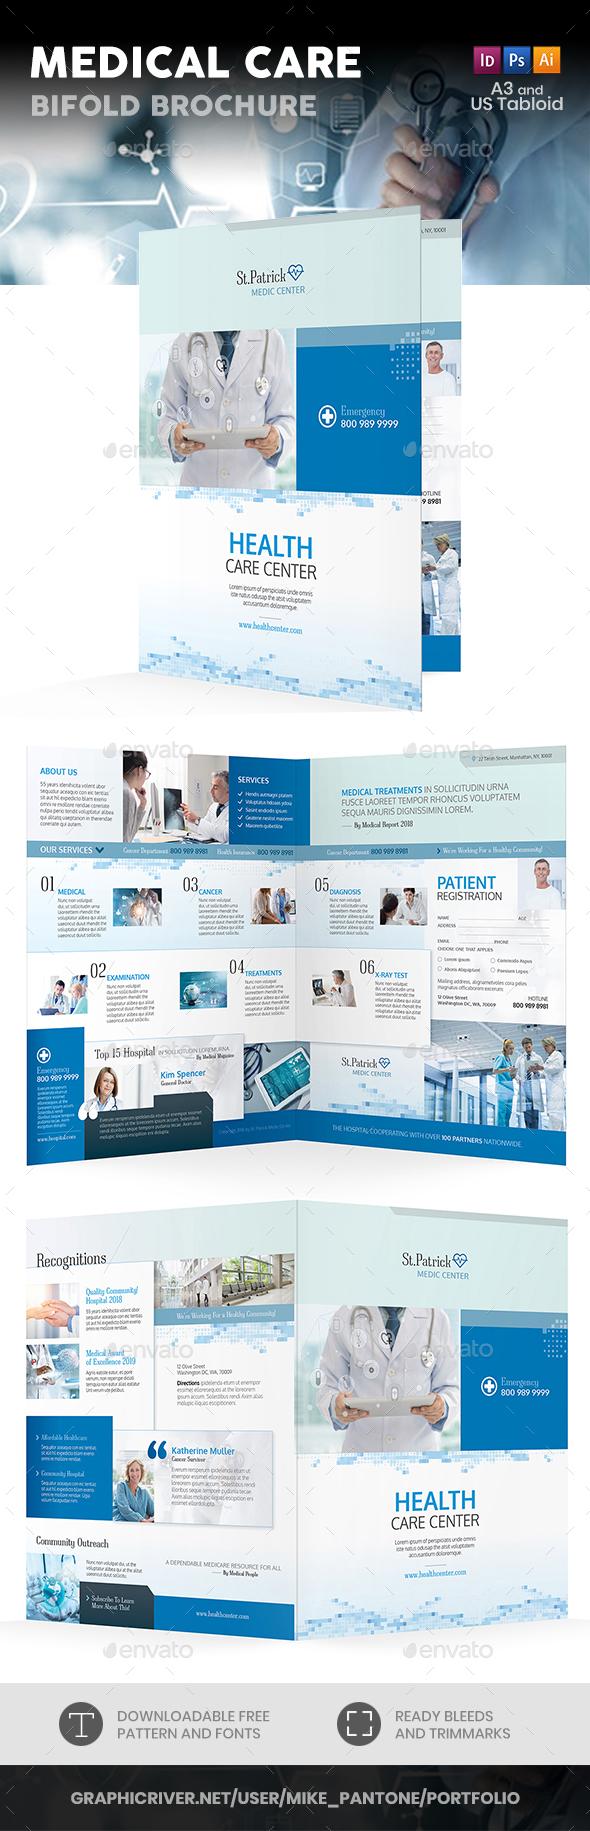 Medical Care Bifold / Halffold Brochure - Informational Brochures